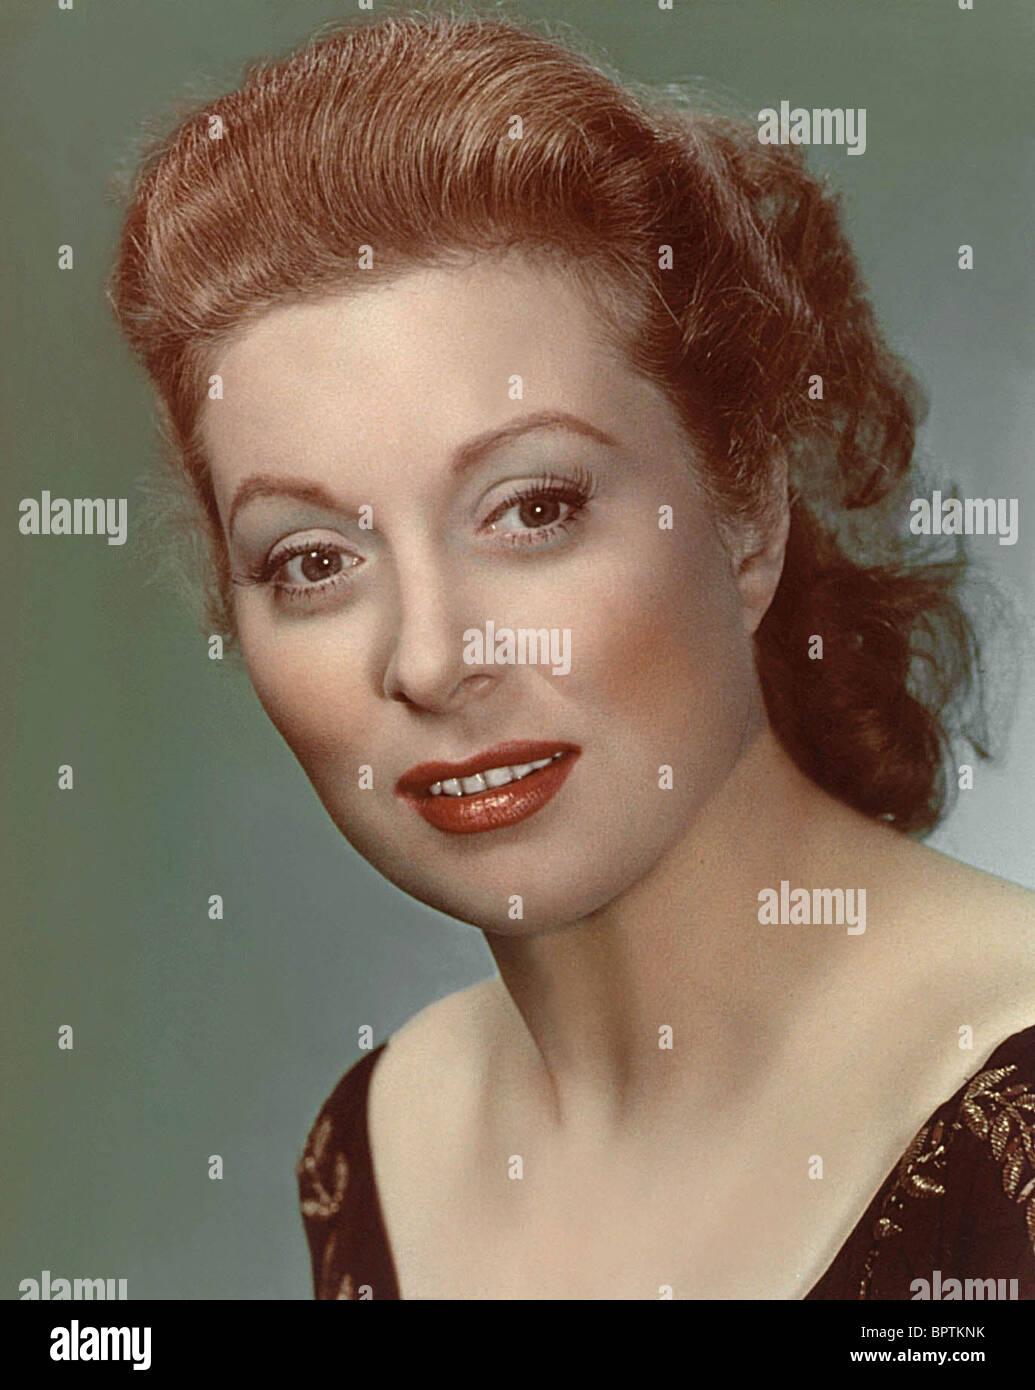 Martha Nosova today 89